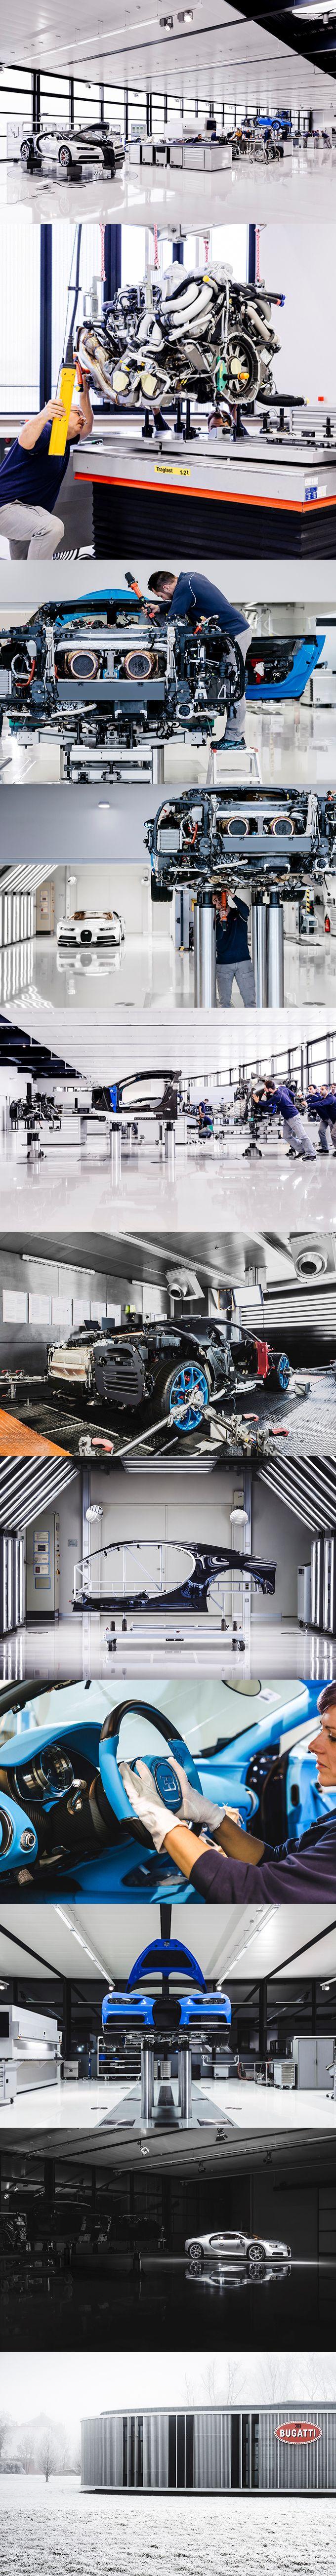 2017 Bugatti Chiron prouction / 1479hp 8.0l W16 / Molsheim France / blue white / 17-324